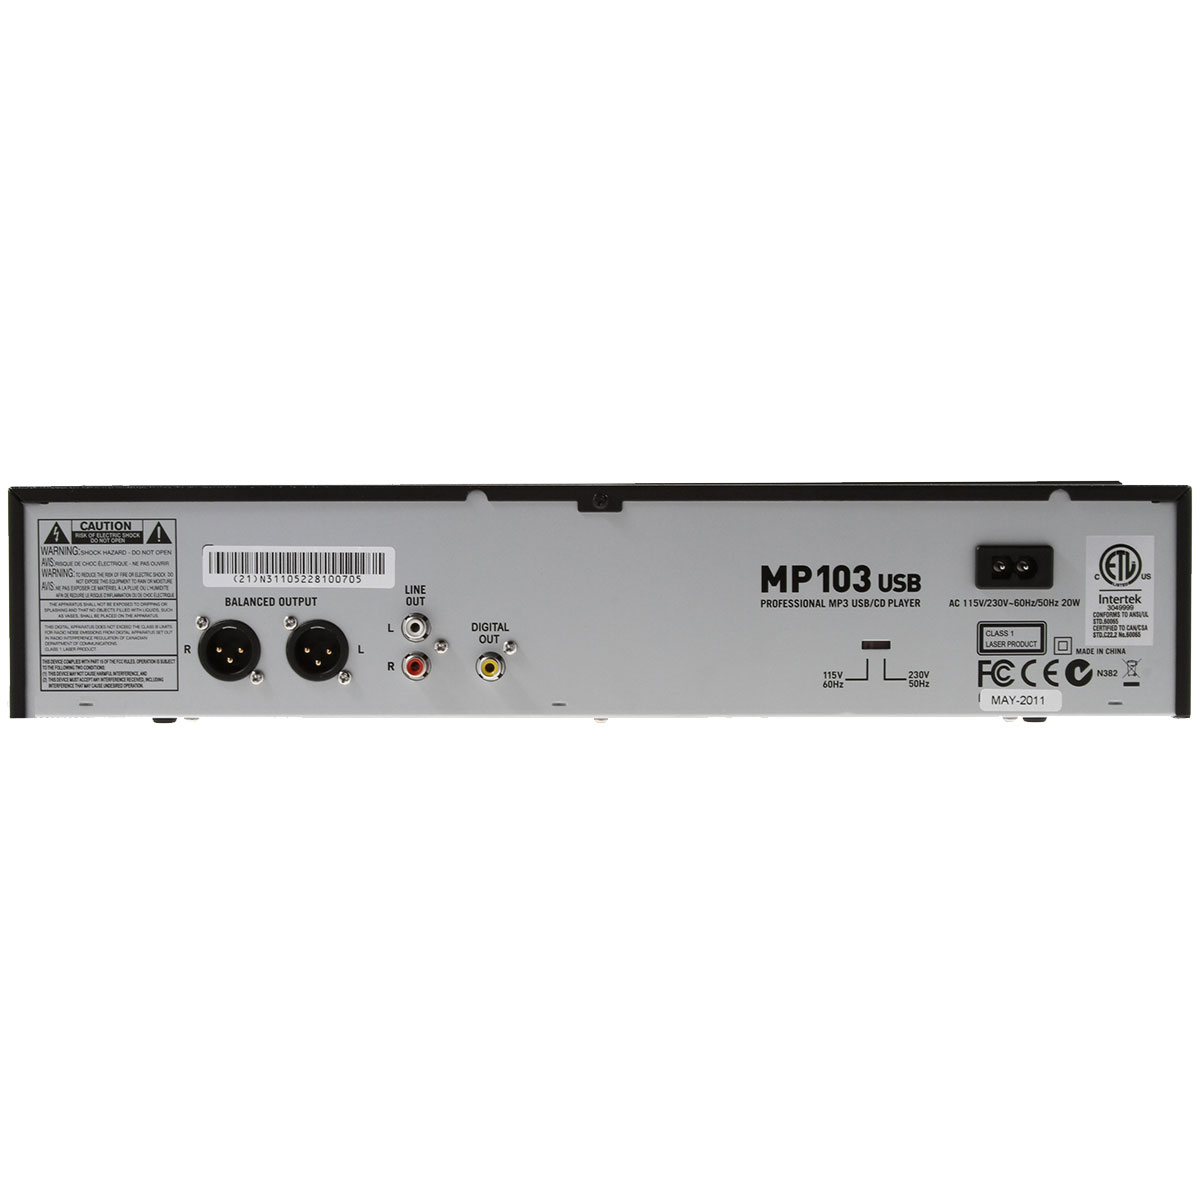 MP103USB - Media Player c/ CD e USB p/ DJ MP 103 USB - Numark